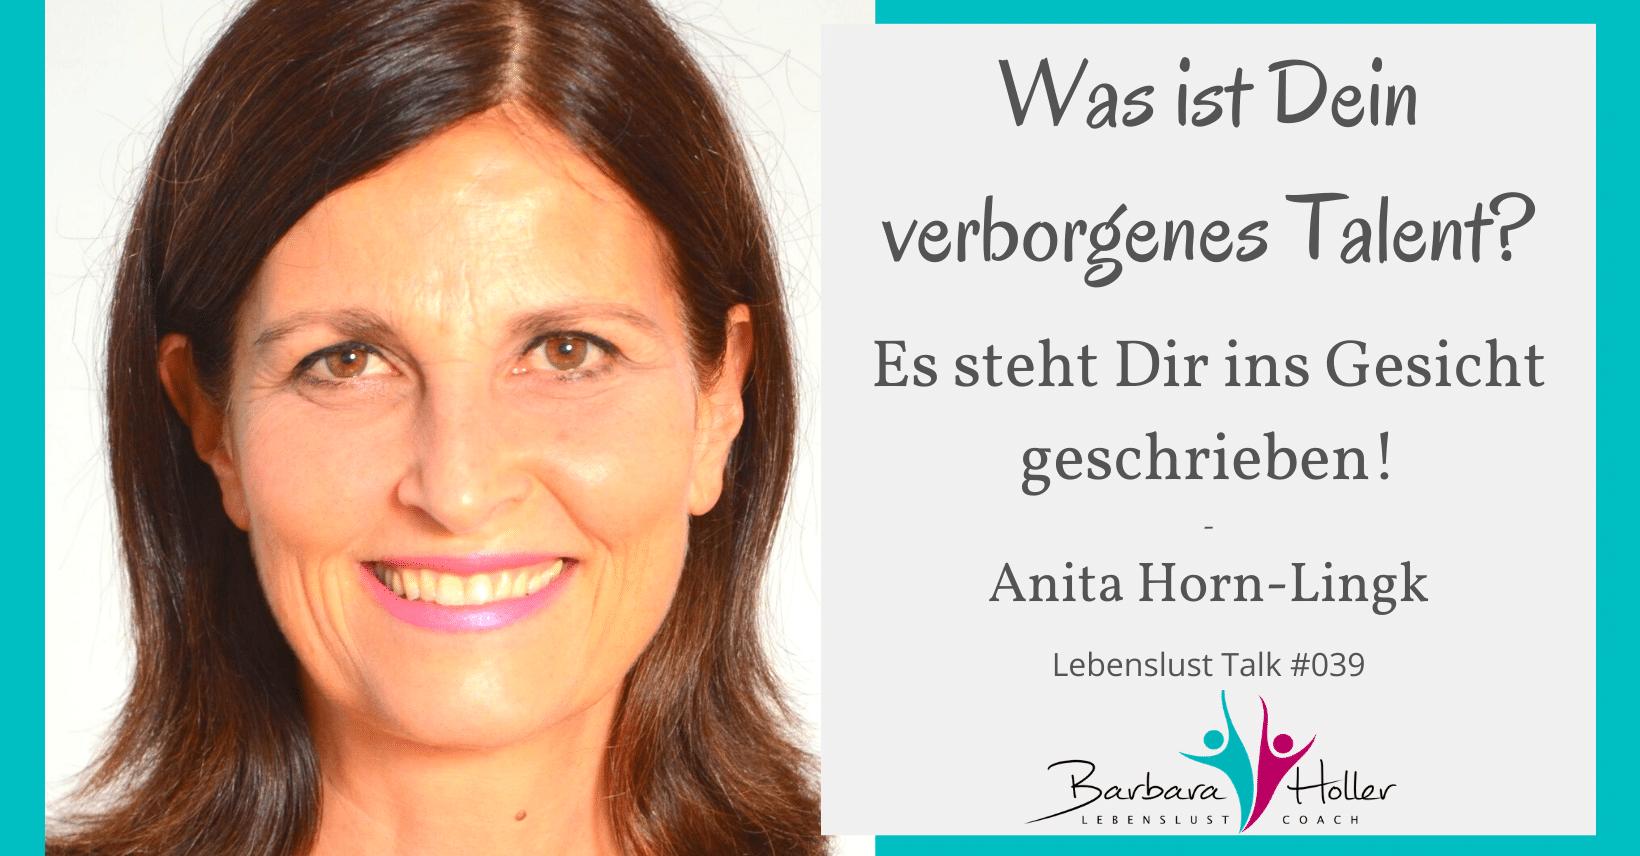 Lebenslust Talk Anita Horn-Lingk